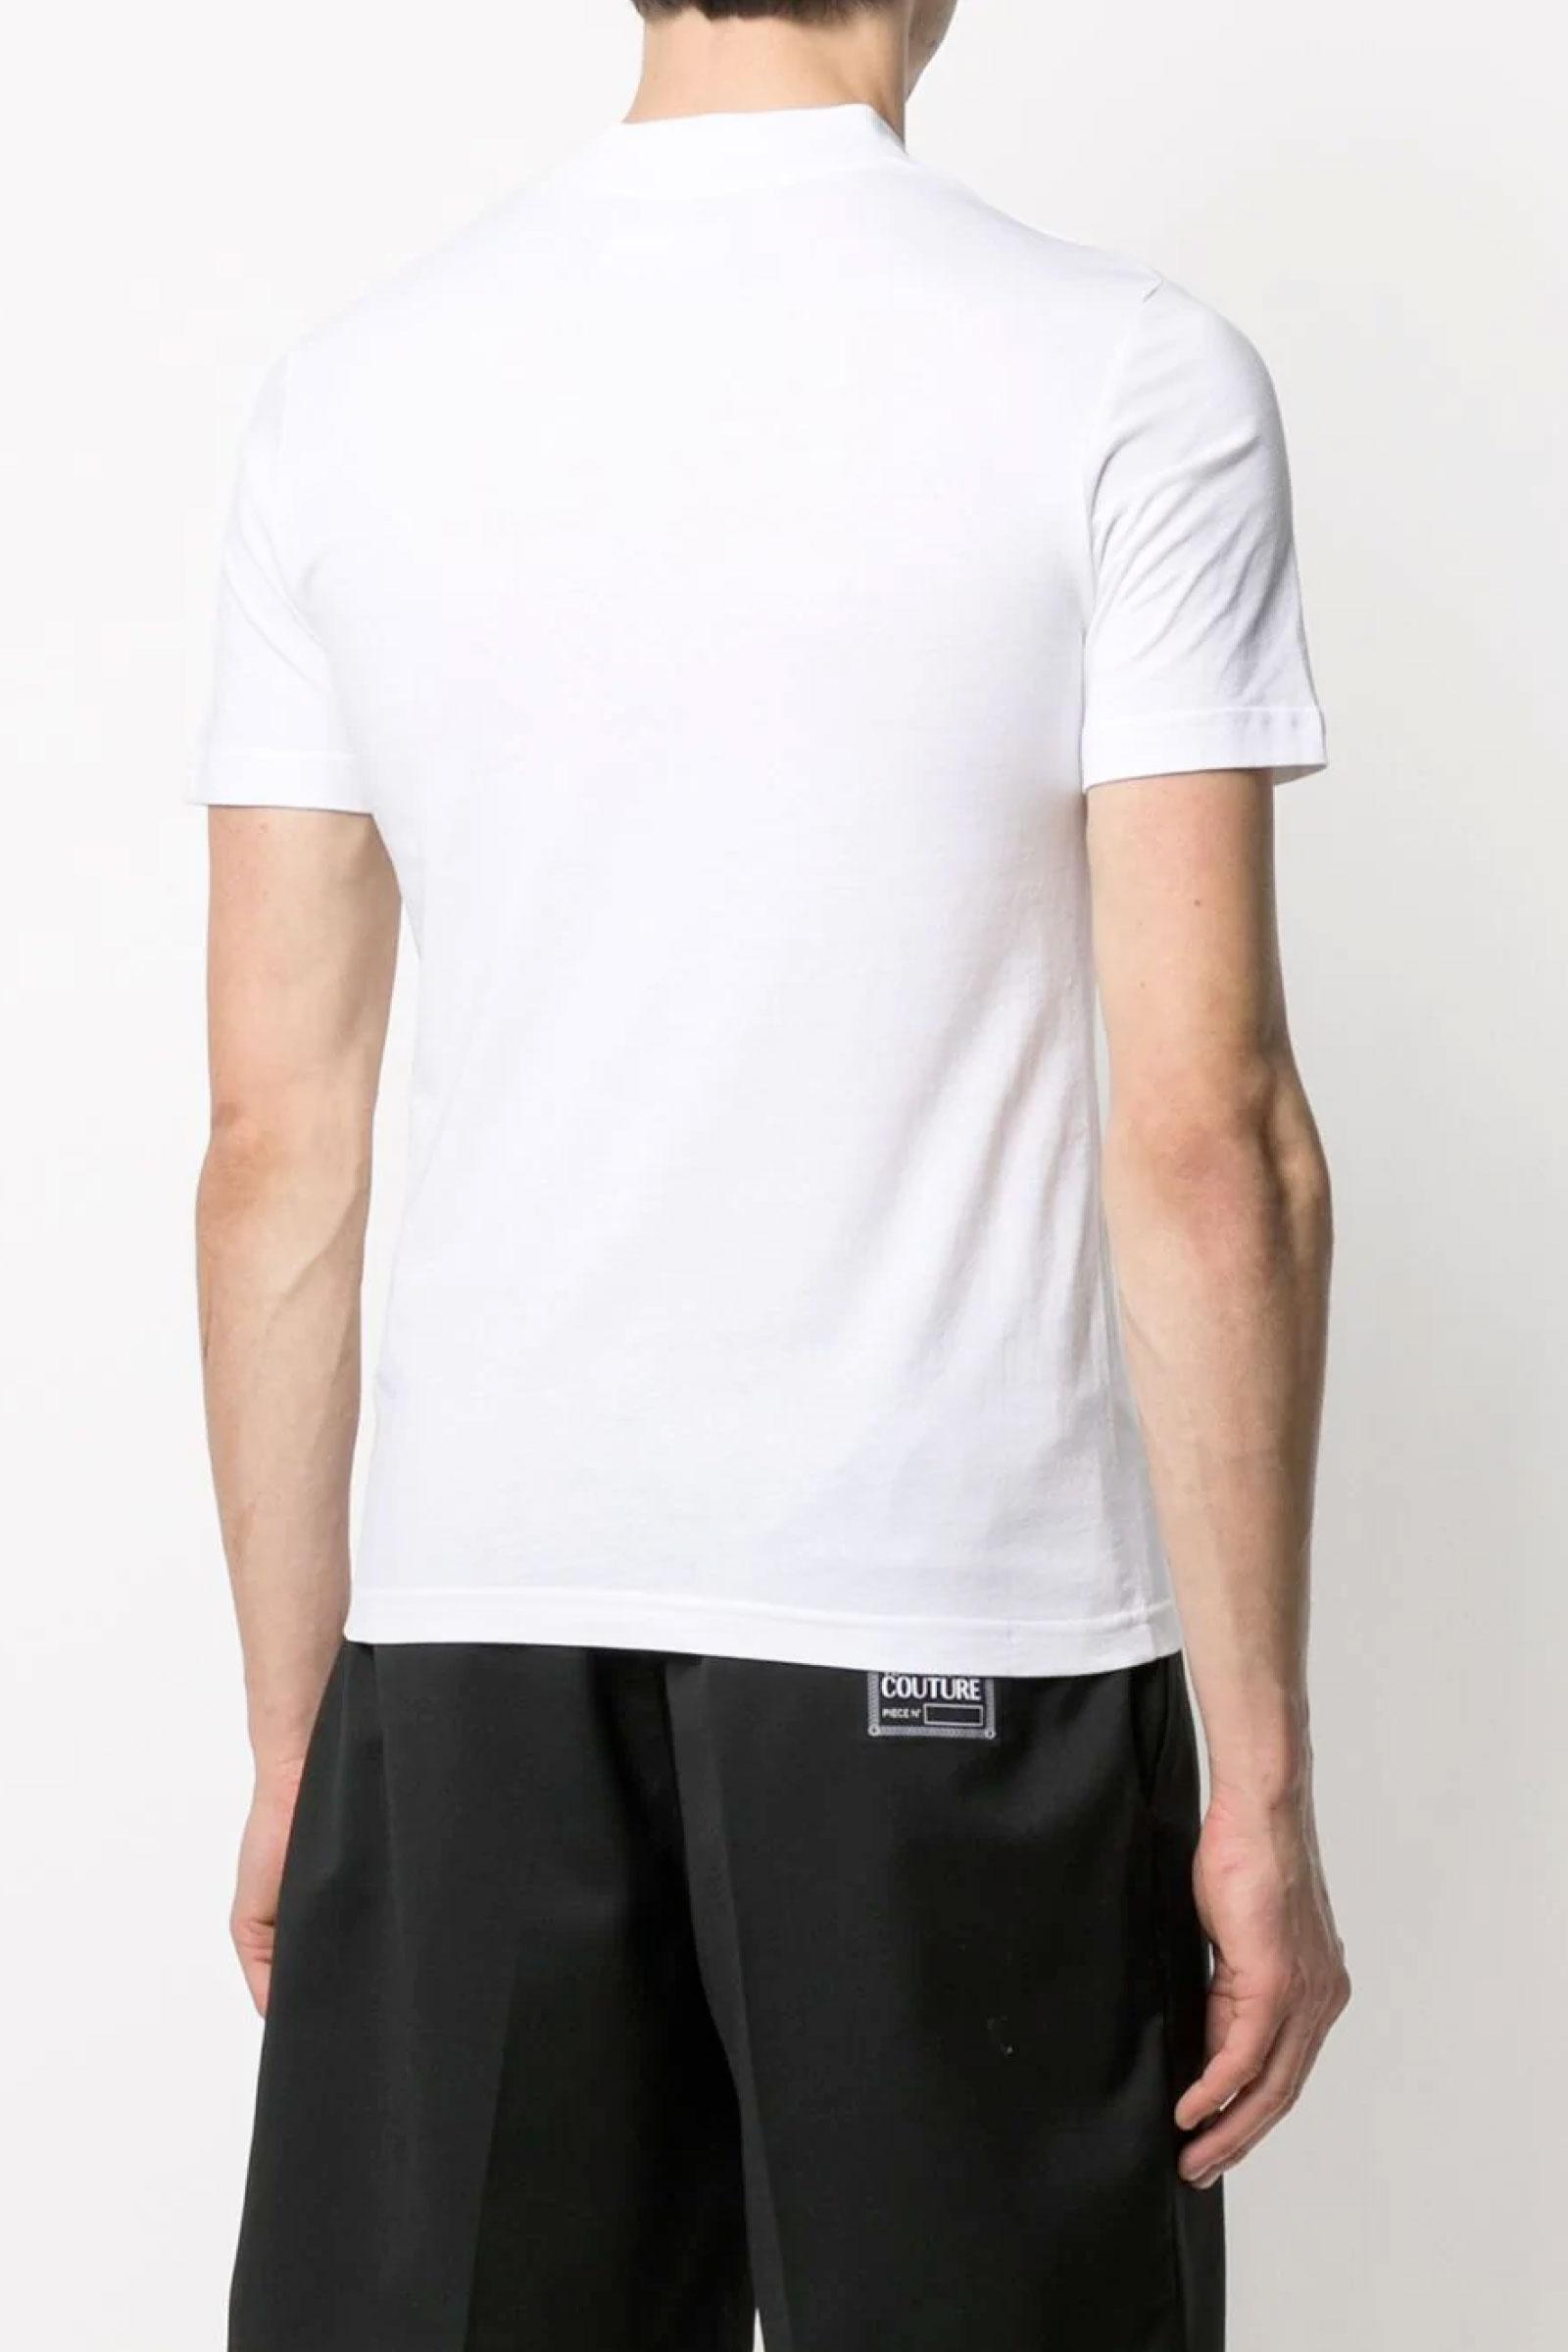 VERSACE JEANS COUTURE Men's T-Shirt VERSACE JEANS COUTURE | T-Shirt | B3GWA720116203